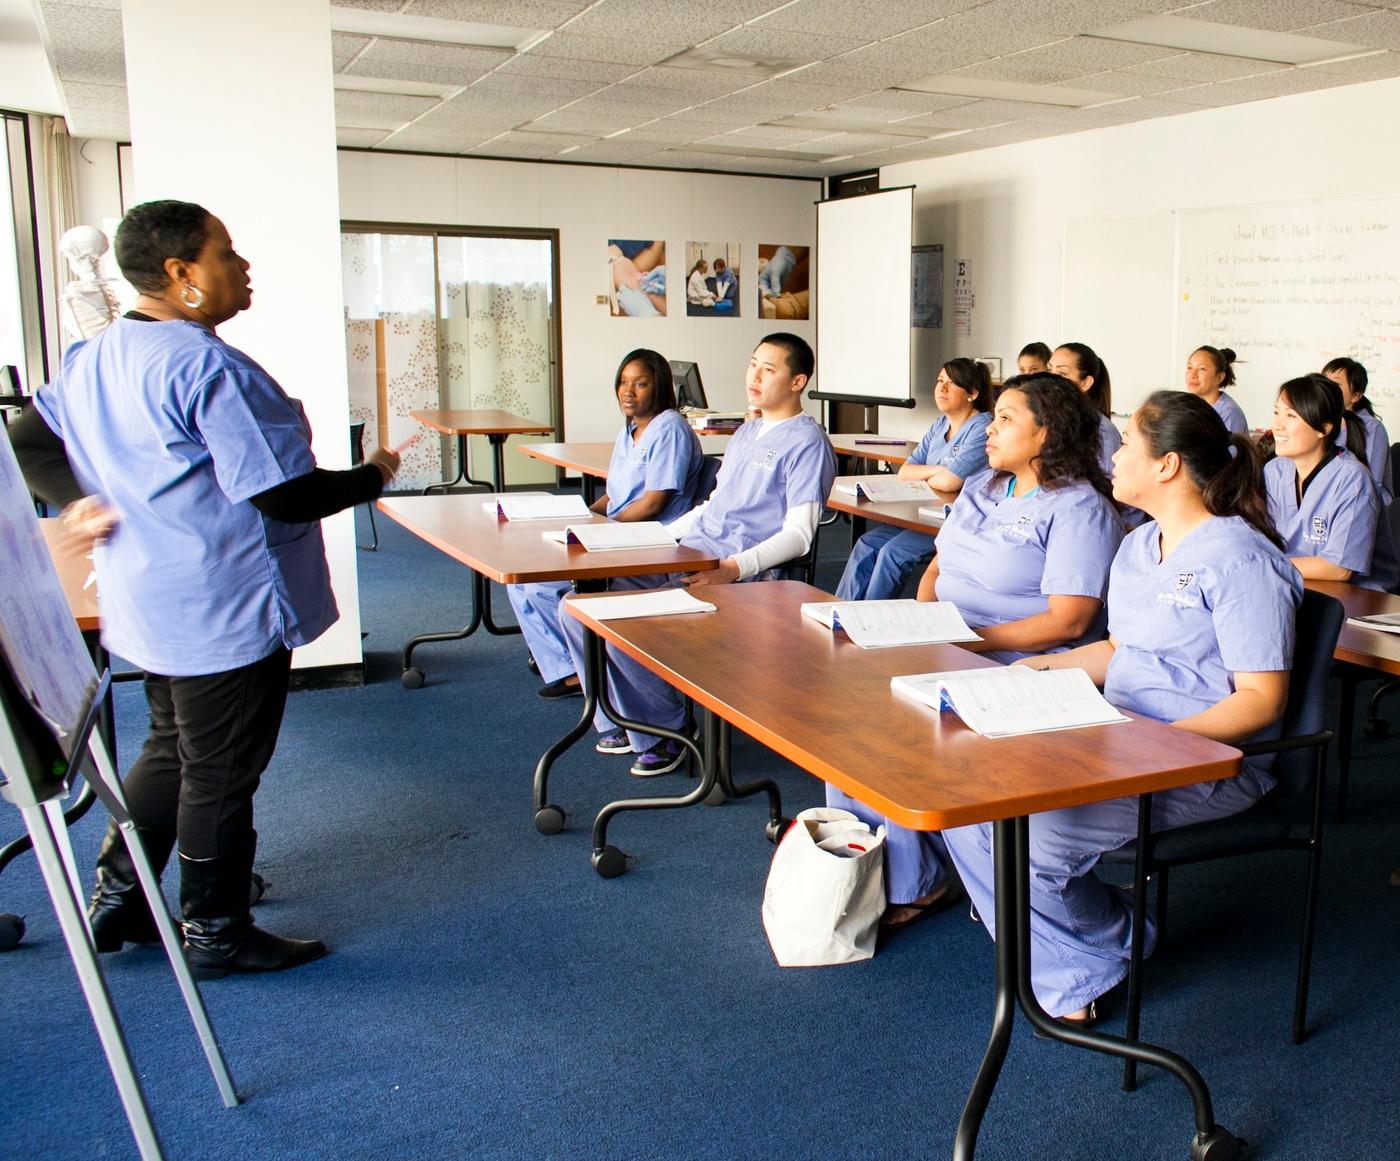 Medical Biller Training For Accountants